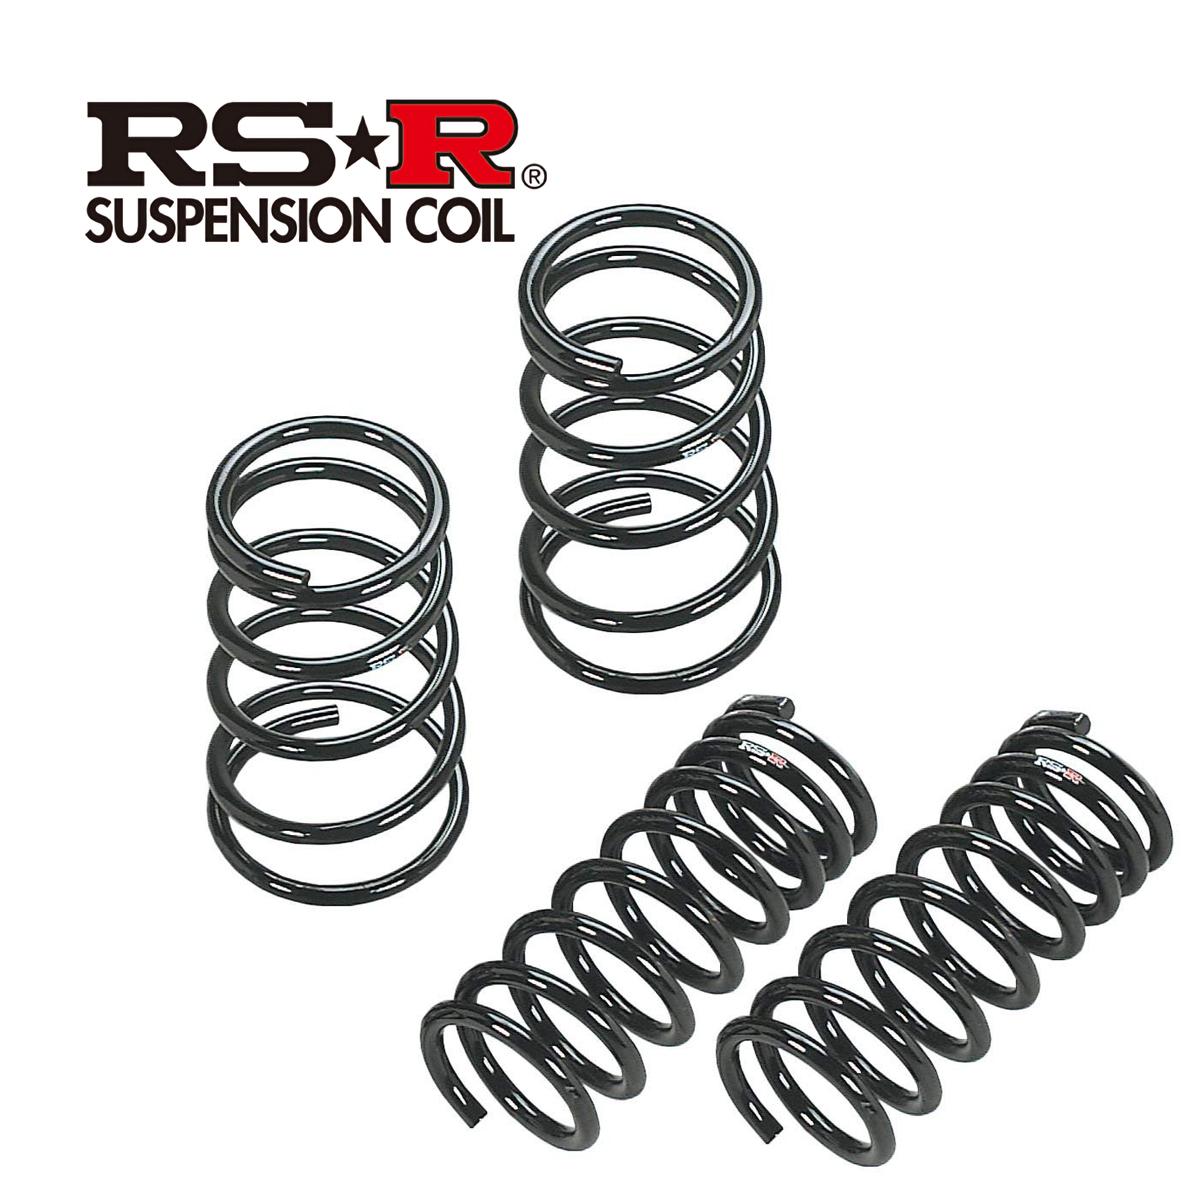 RS-R GS450h バージョンL GWL10 ダウンサス スプリング 1台分 T174S RSR スーパーダウン RSR 個人宅発送追金有